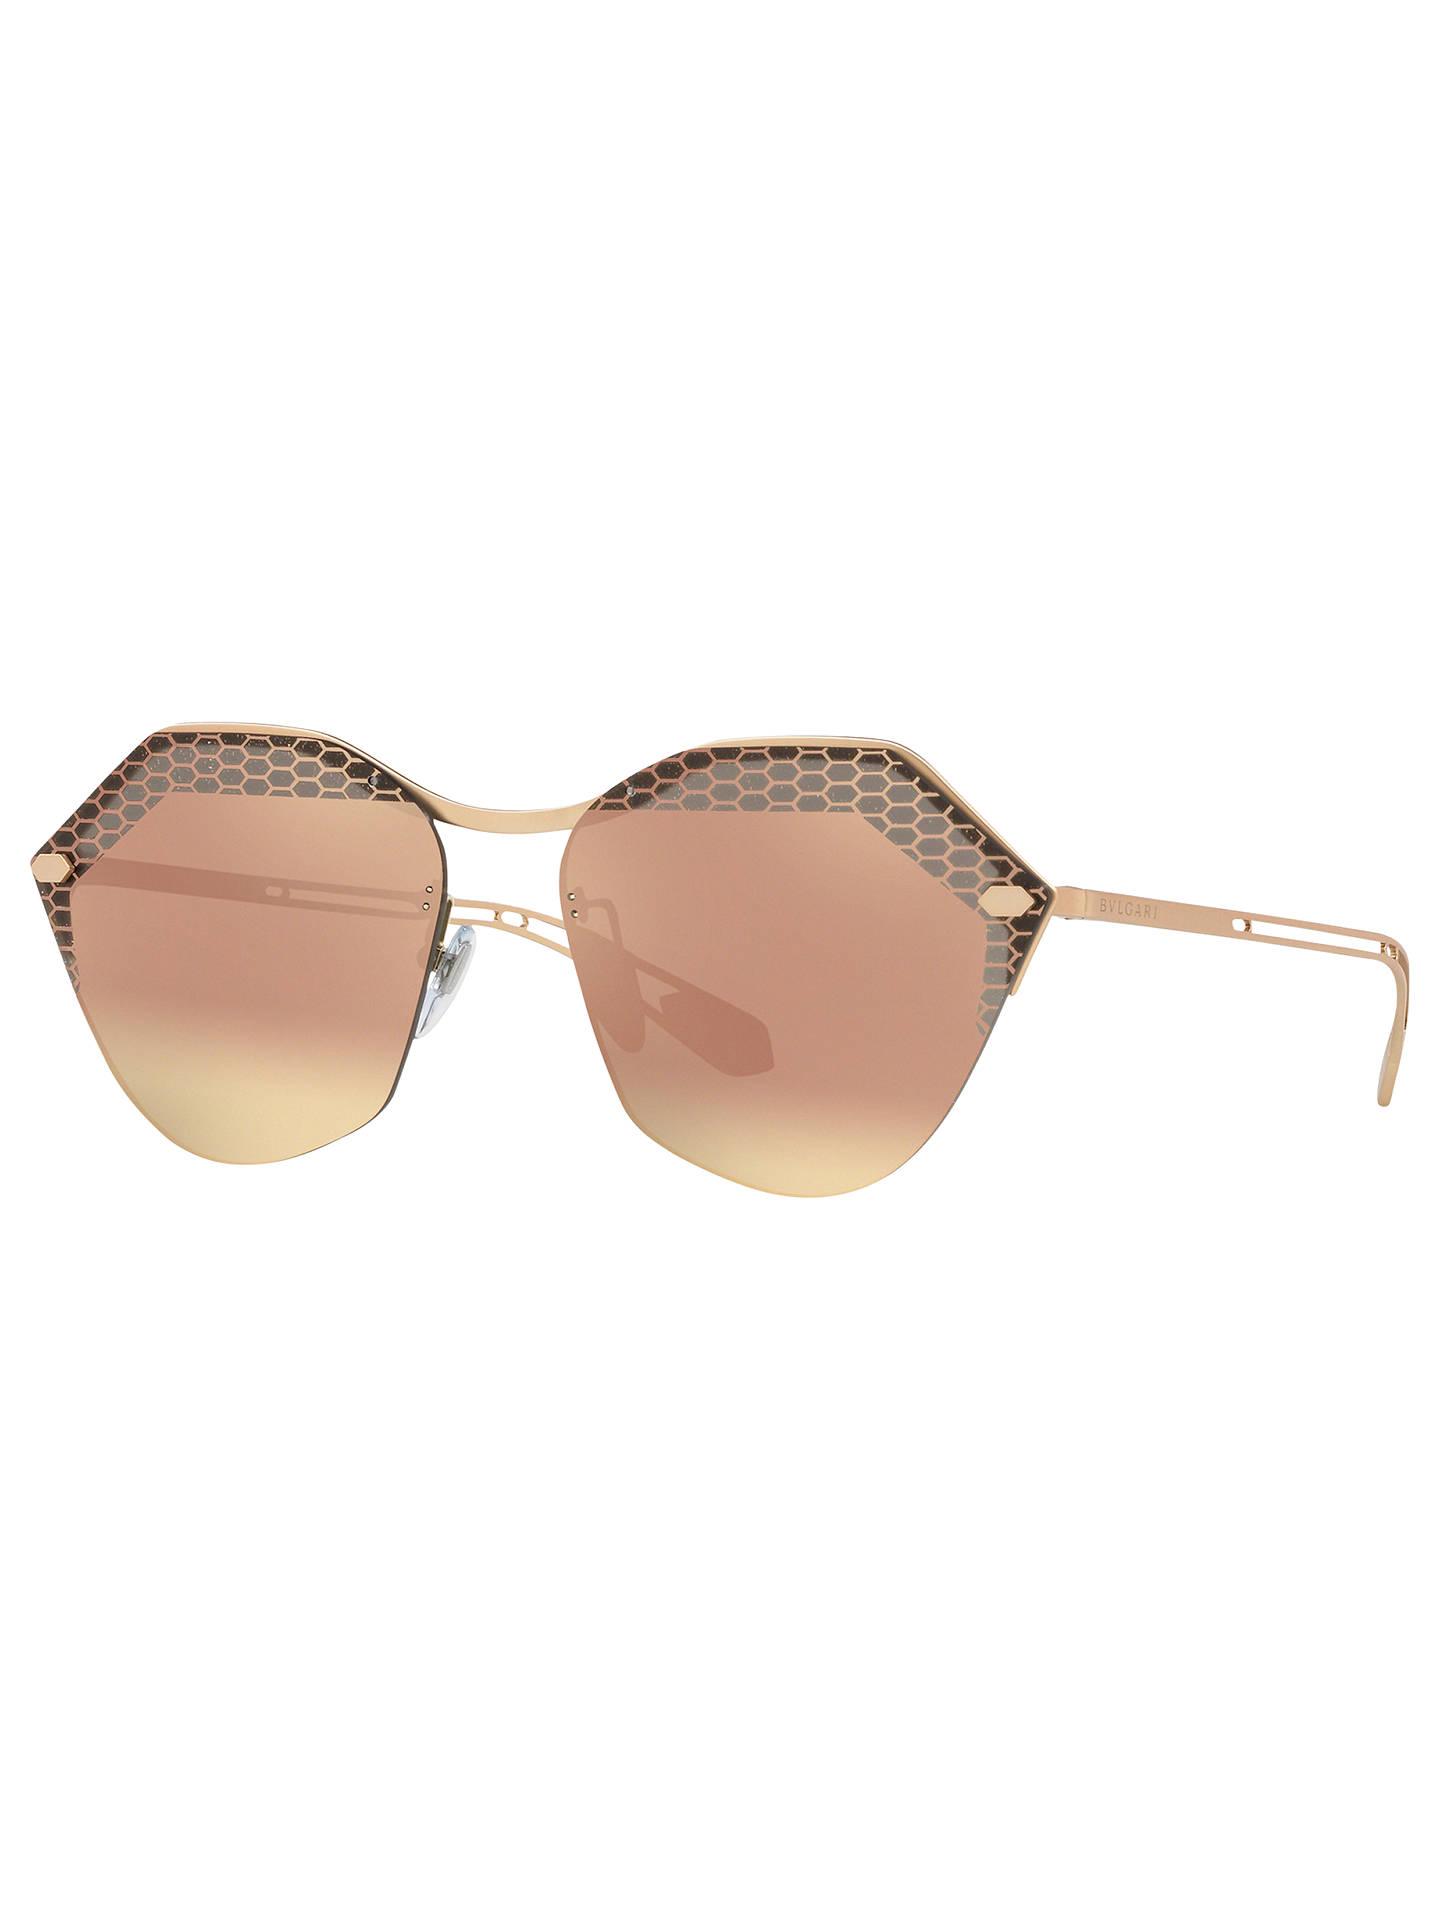 aaa69194776de9 BVLGARI BV6109 Women s Irregular Sunglasses at John Lewis   Partners